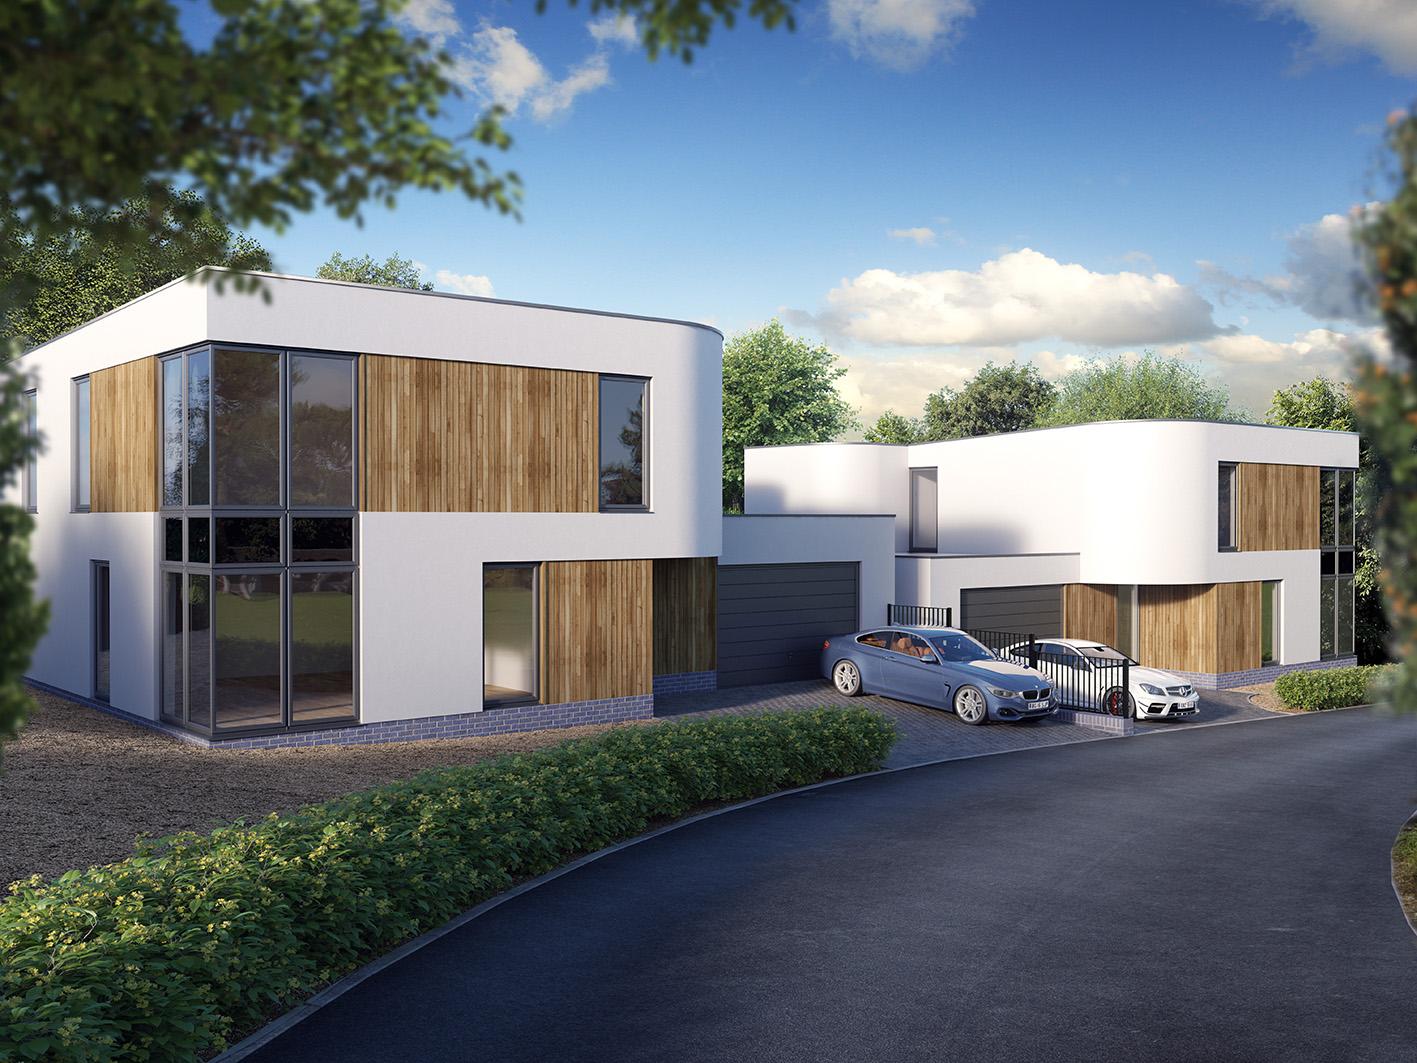 architectural illustrations, architectural visualisation, artists impression, property CGI, housing cgi, cgi midlands, cgi birmingham, best property cgi